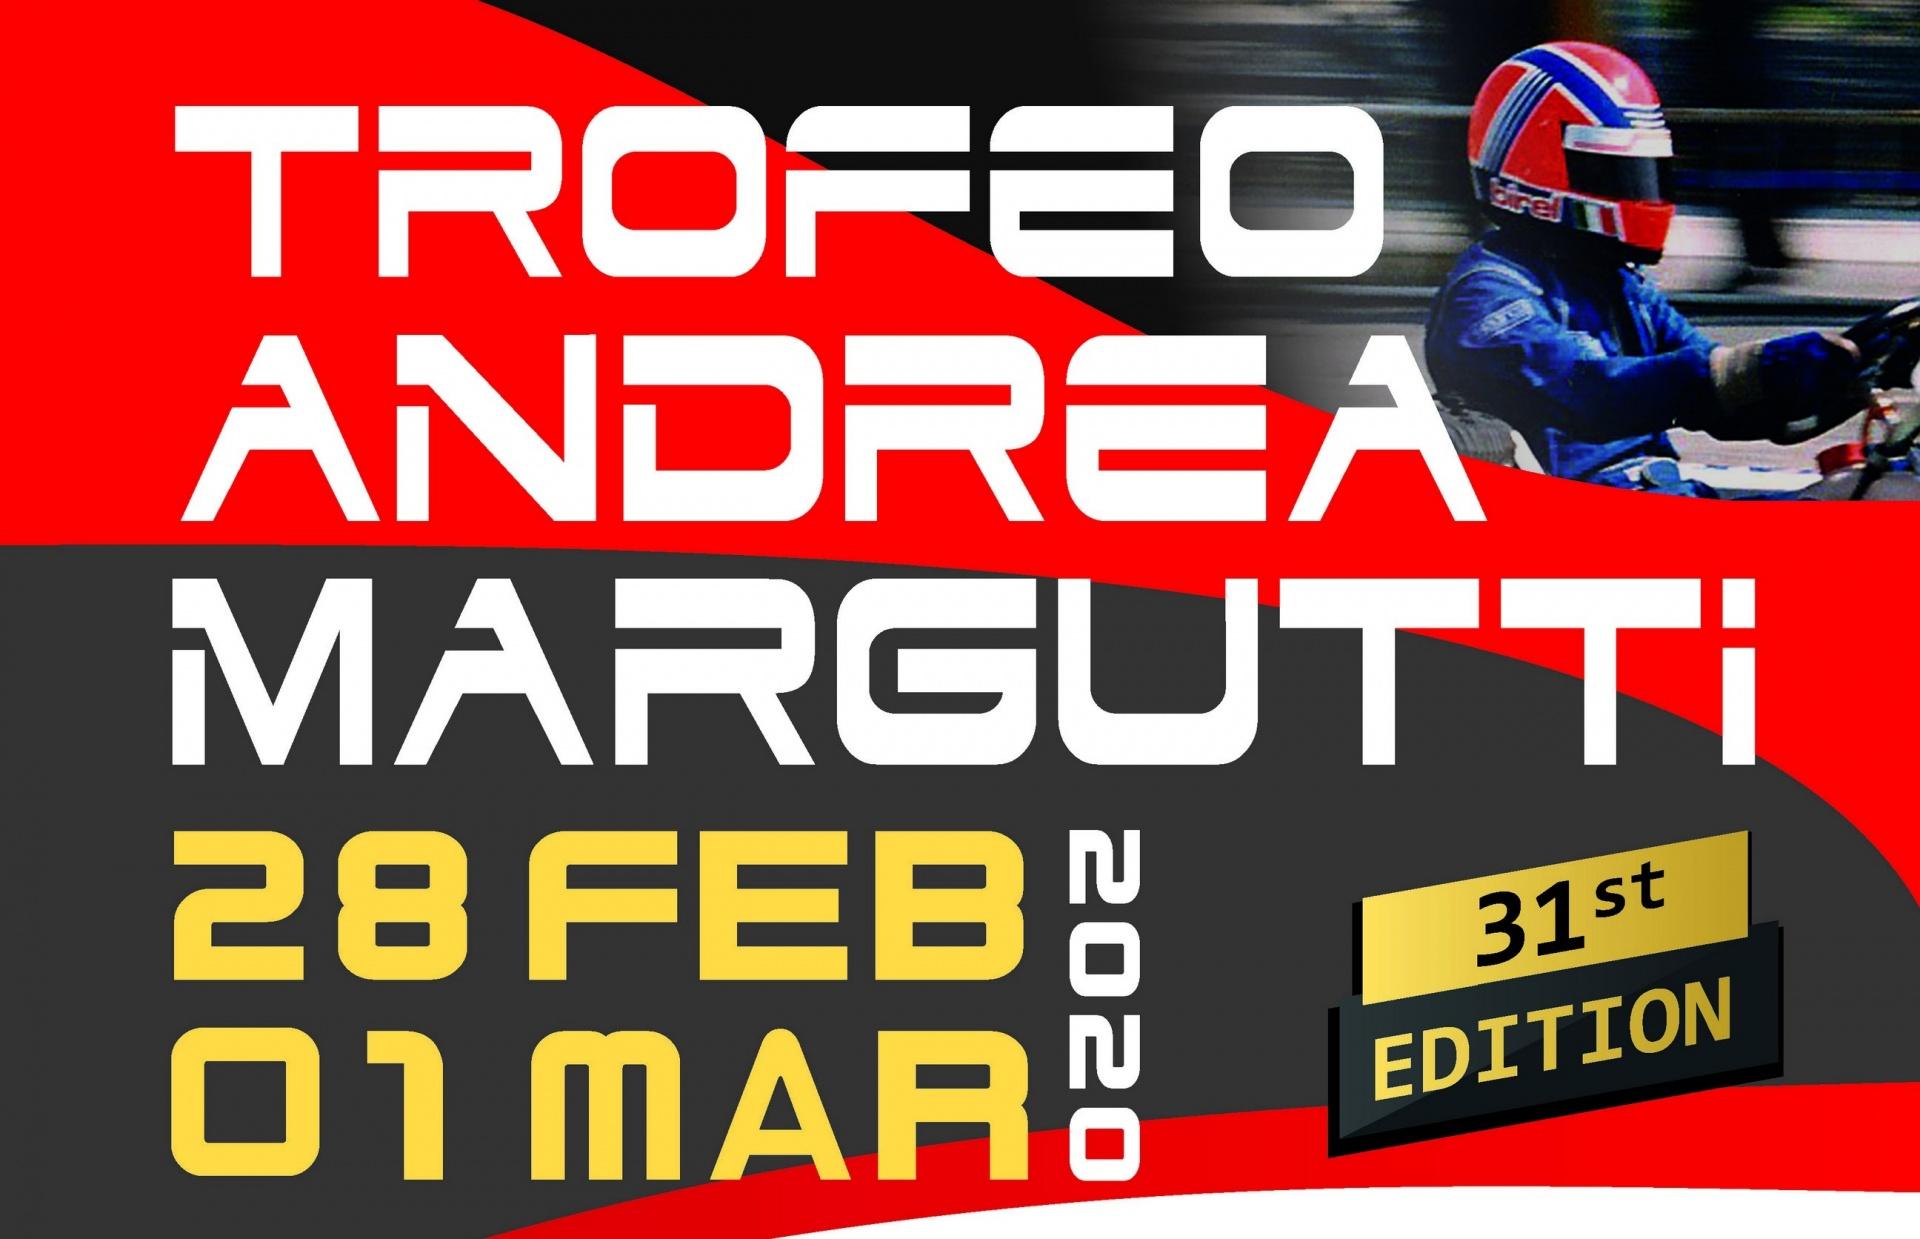 El Coronavirus aplaza el Trofeo Andrea Margutti